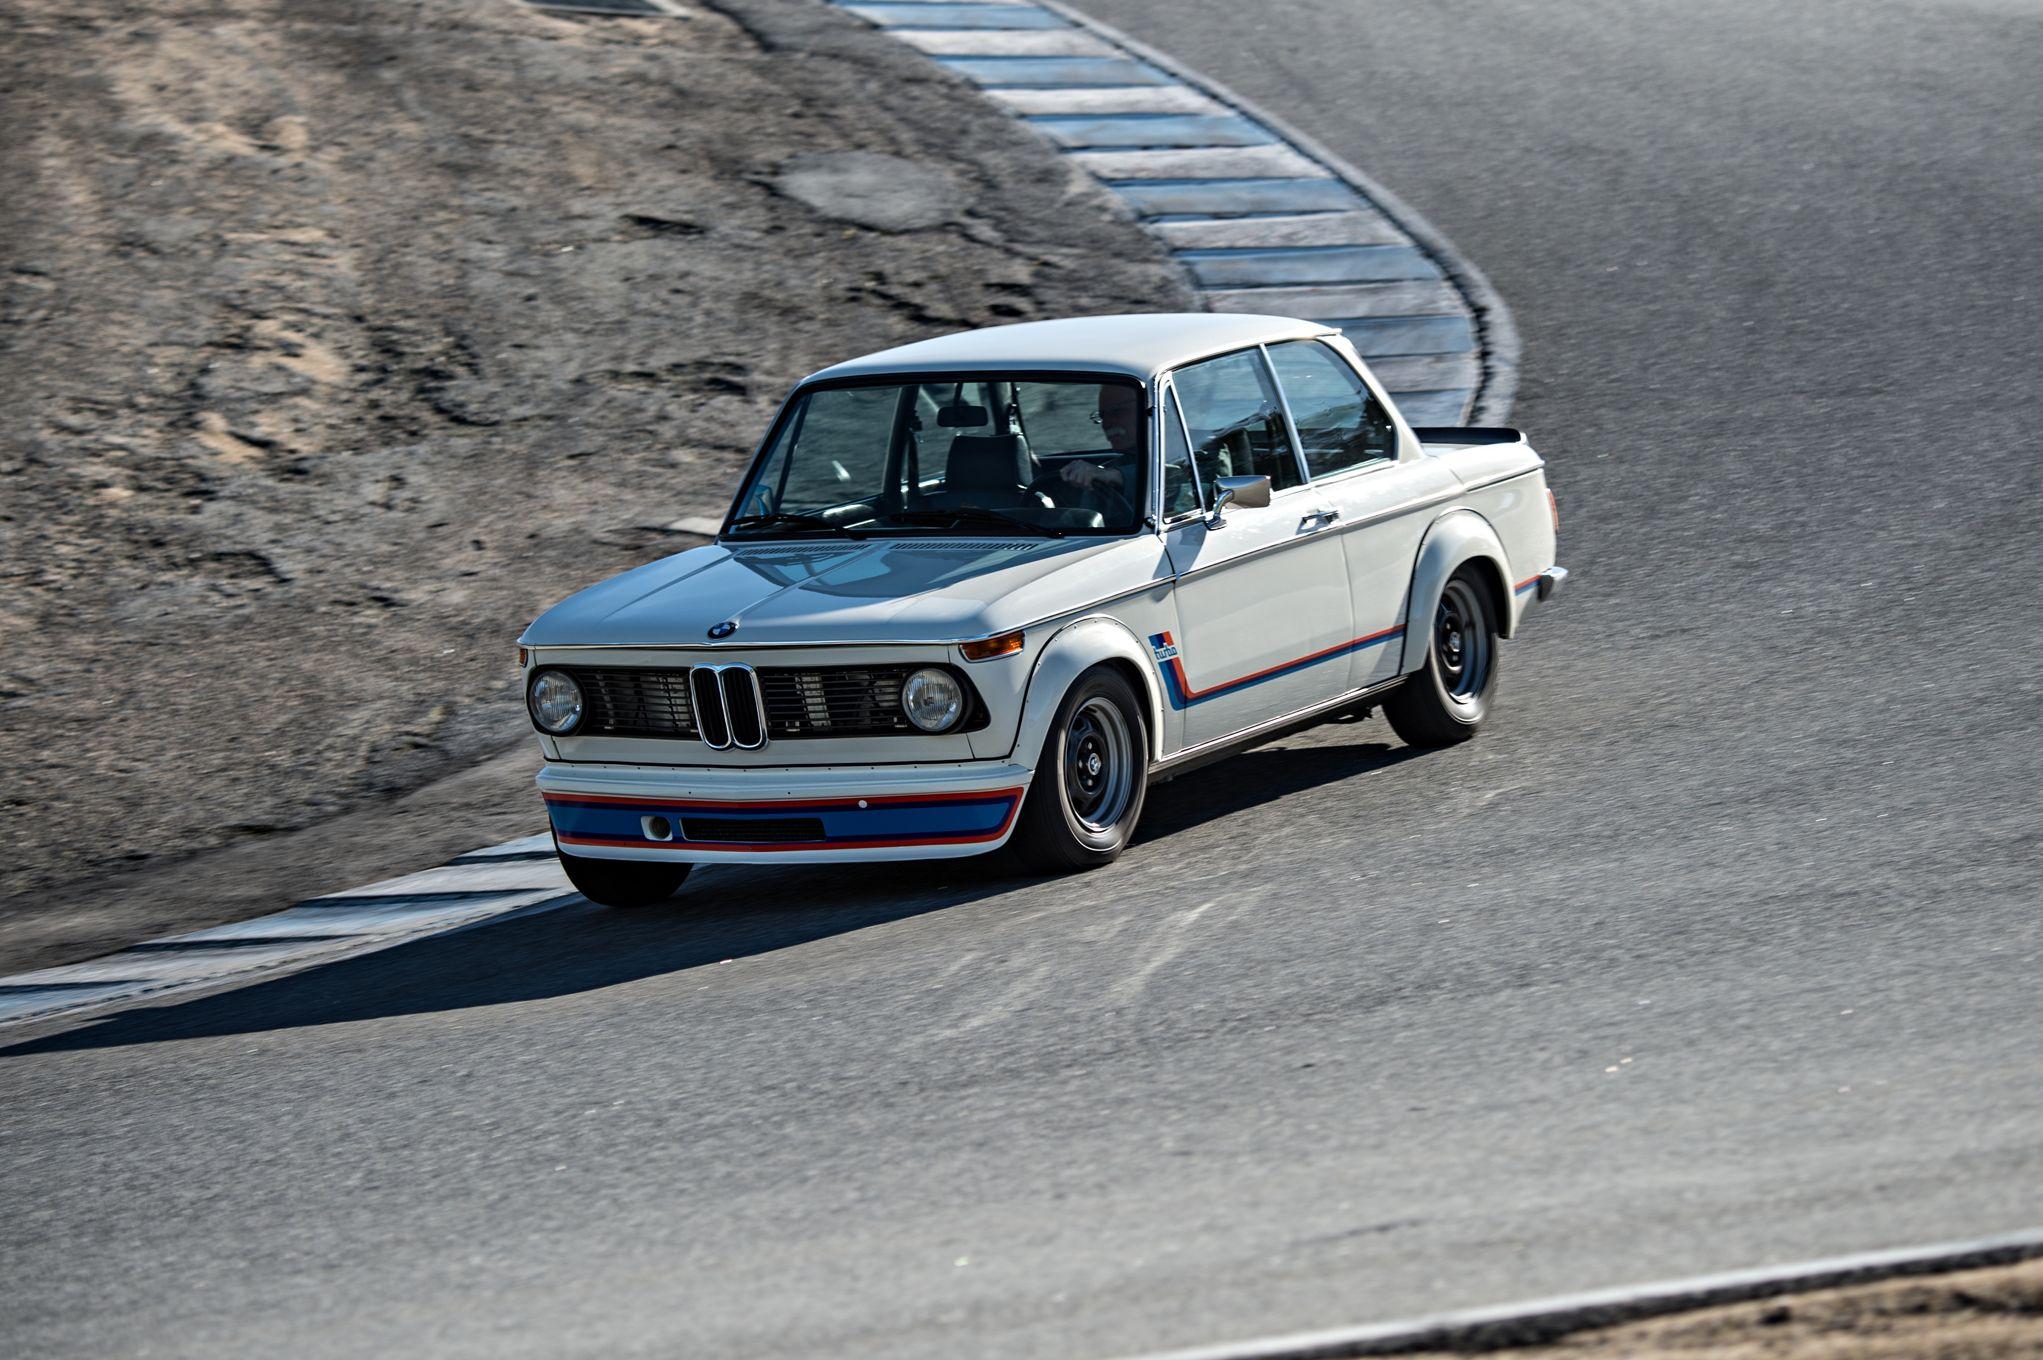 bmw-2002-turbo-front-three-quarter-in-motion-03.jpg